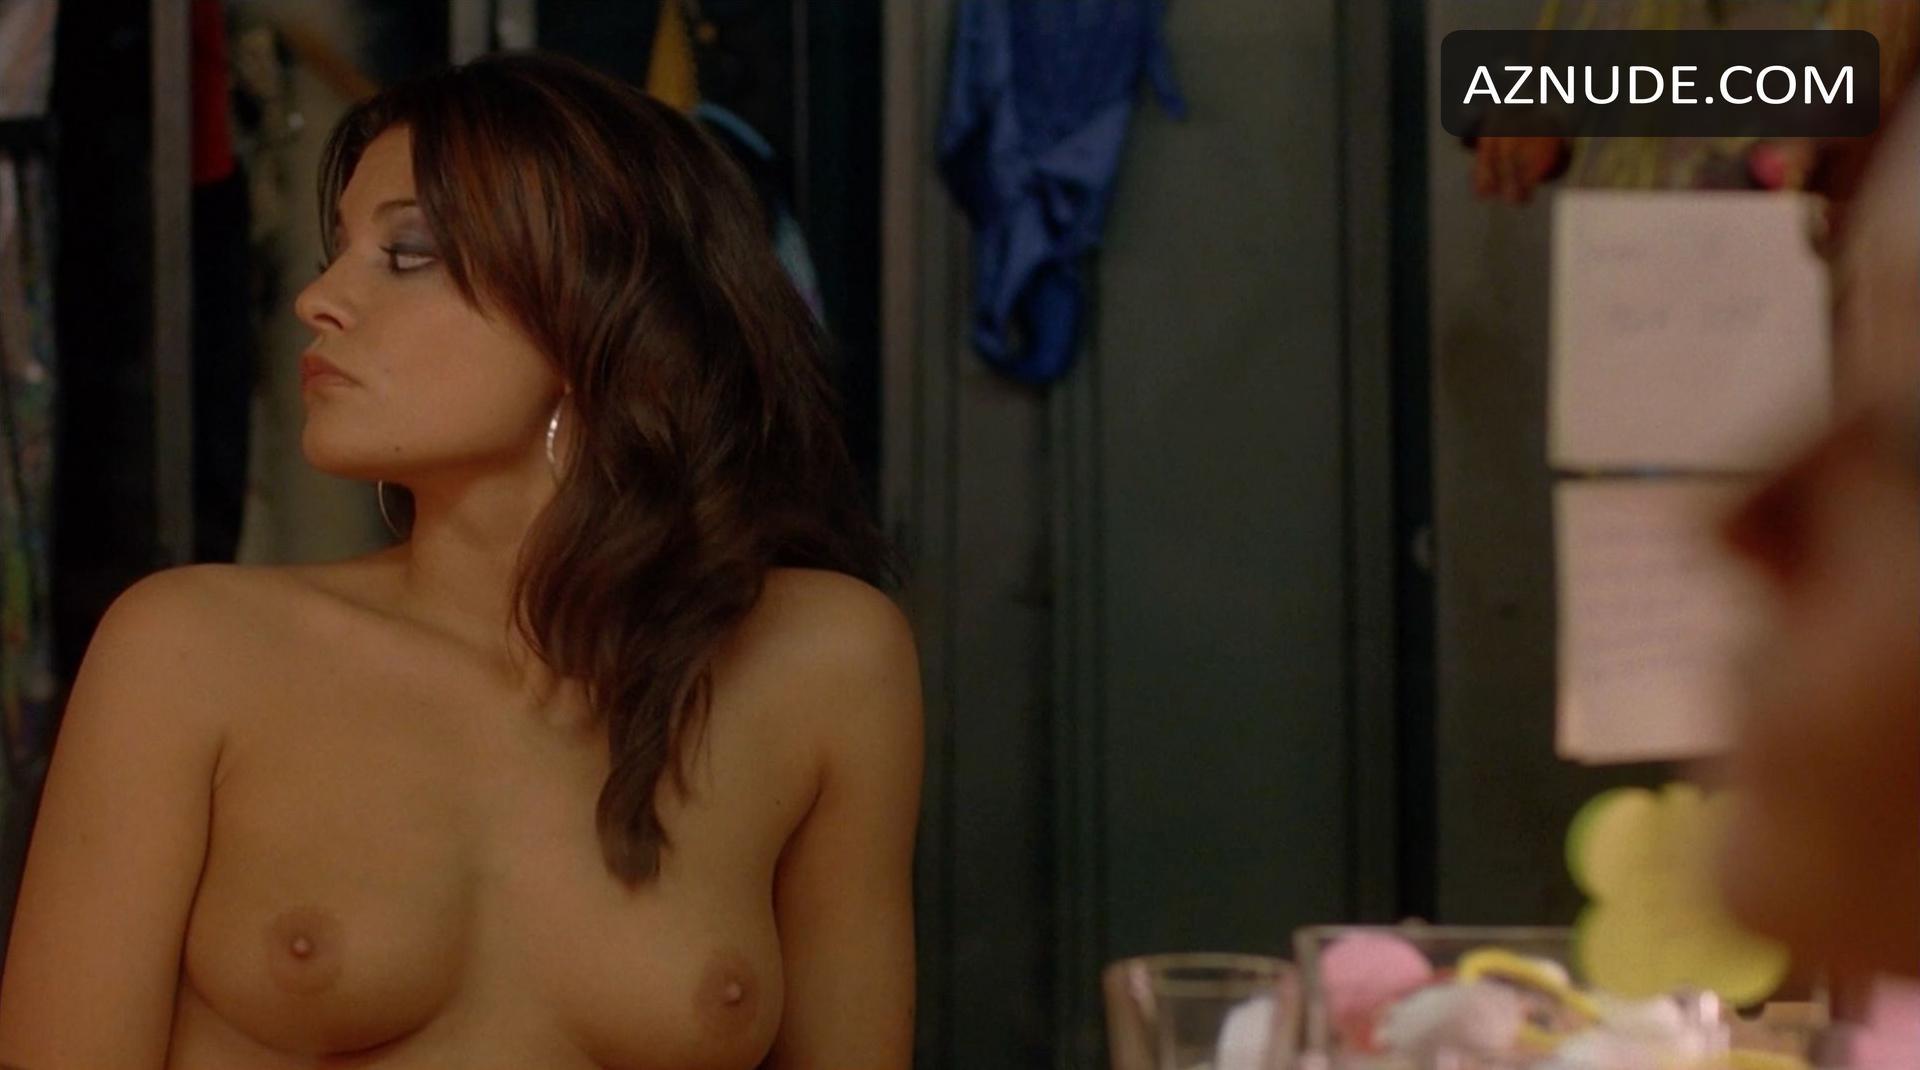 8Mm 2 Porn 8mm 2 nude scenes aznude | download free nude porn picture